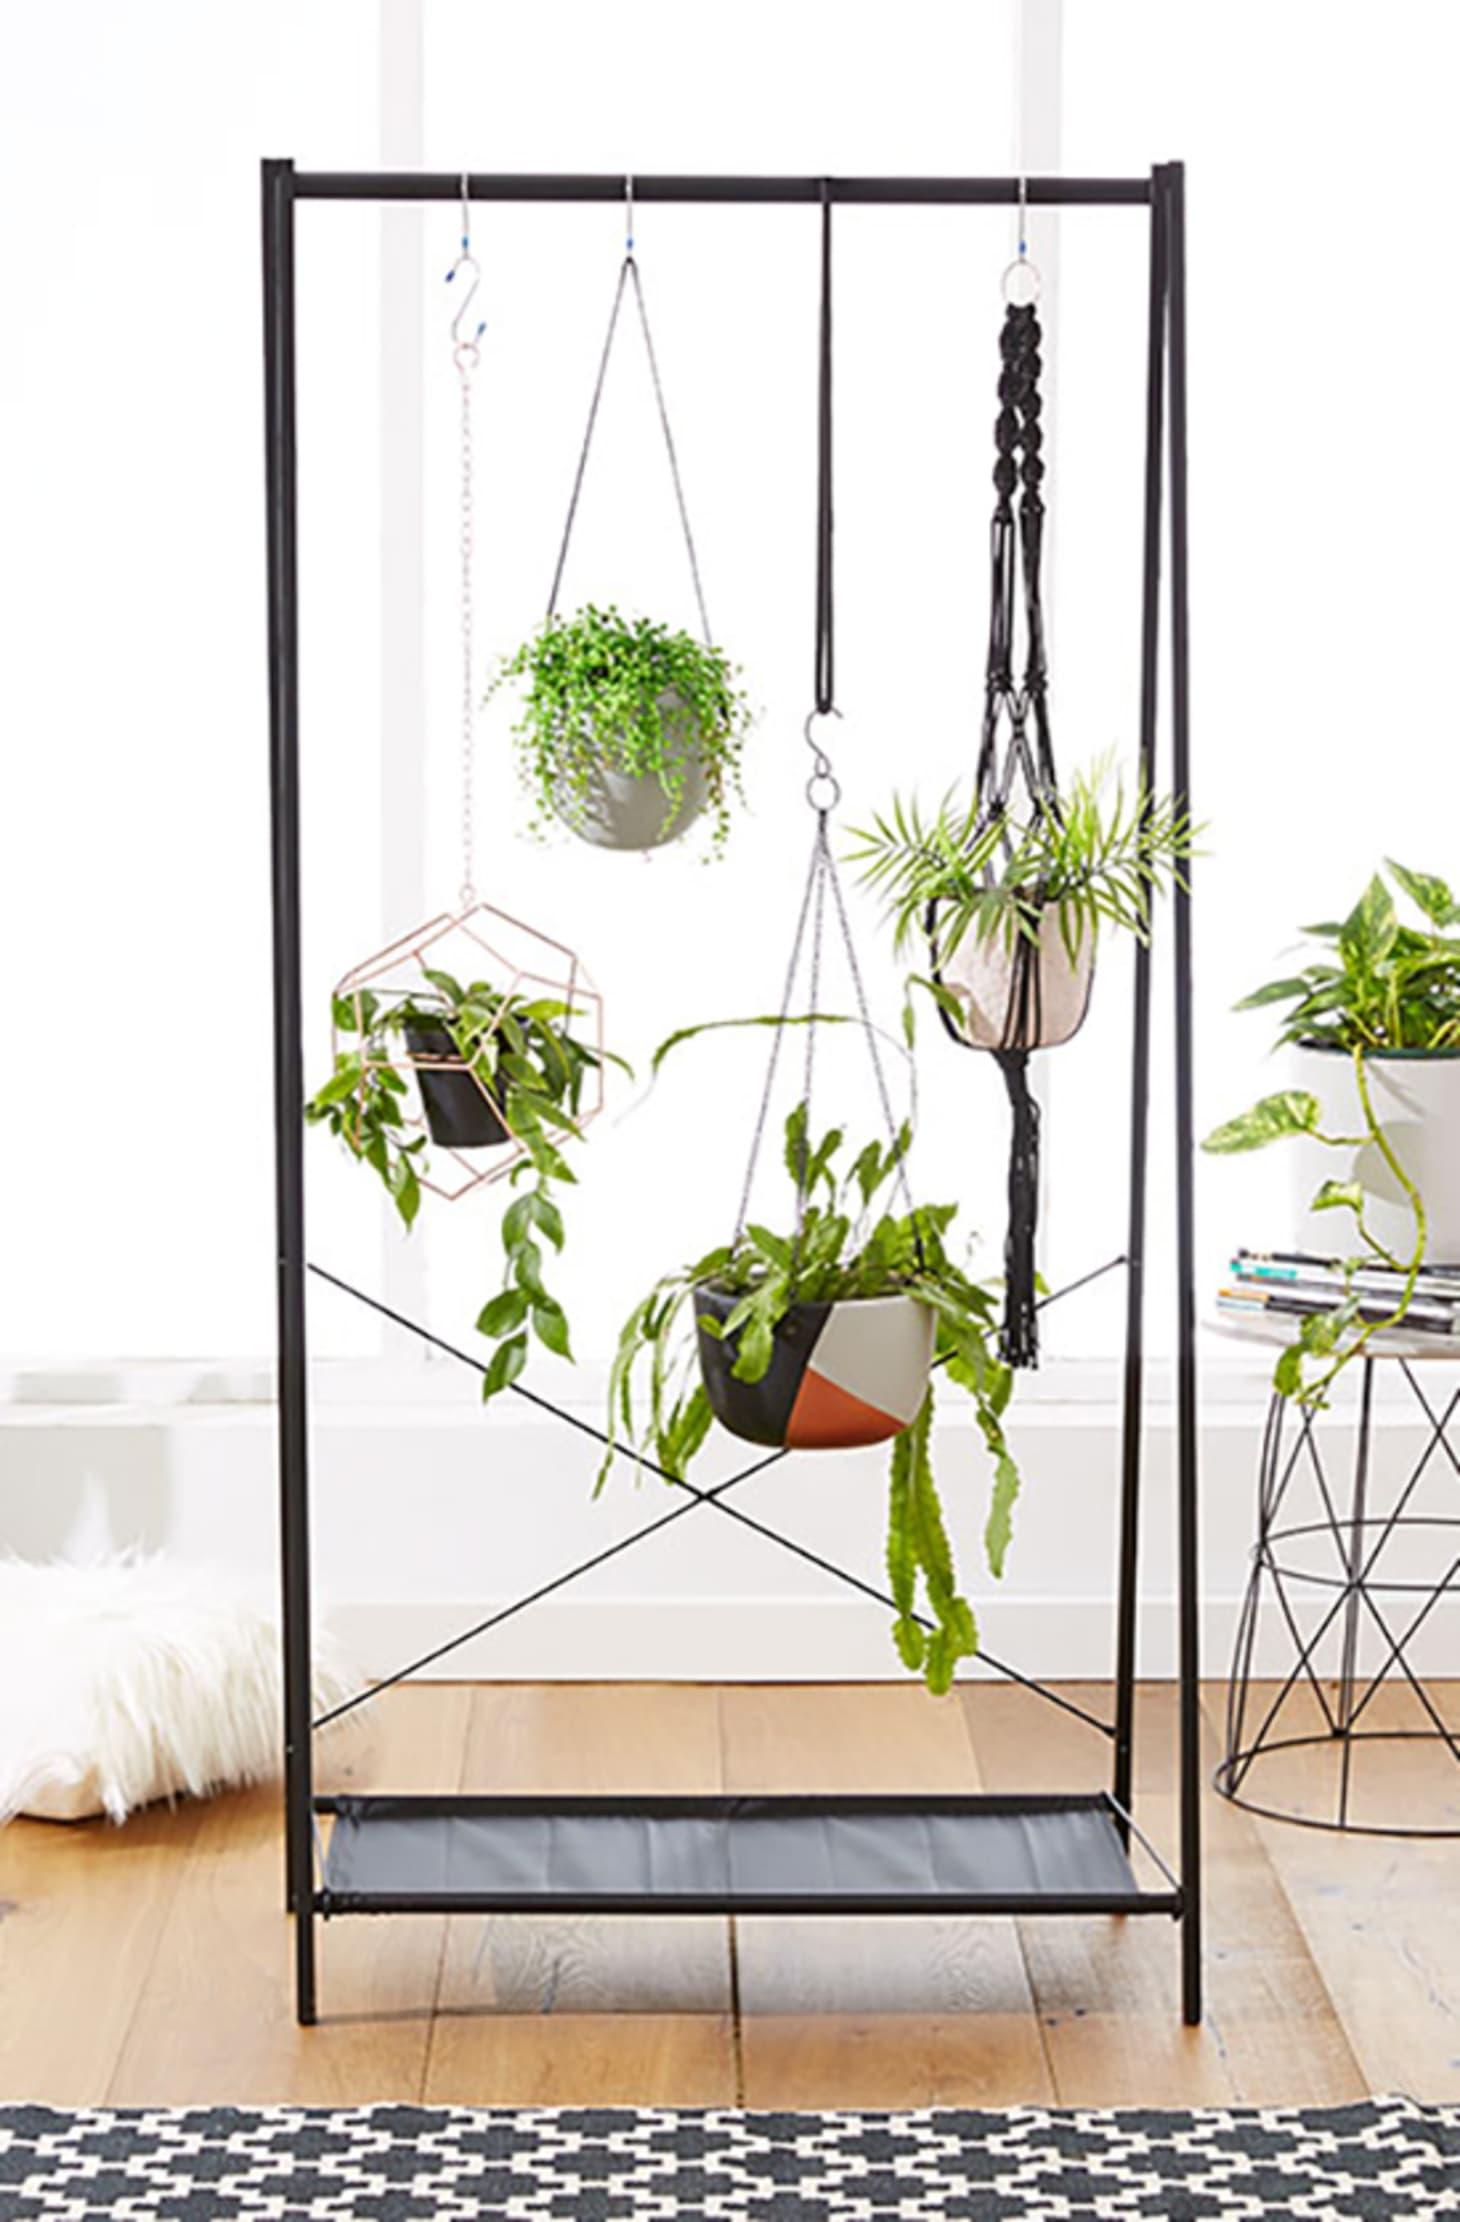 15 Indoor Garden Ideas for Wannabe Gardeners in Small